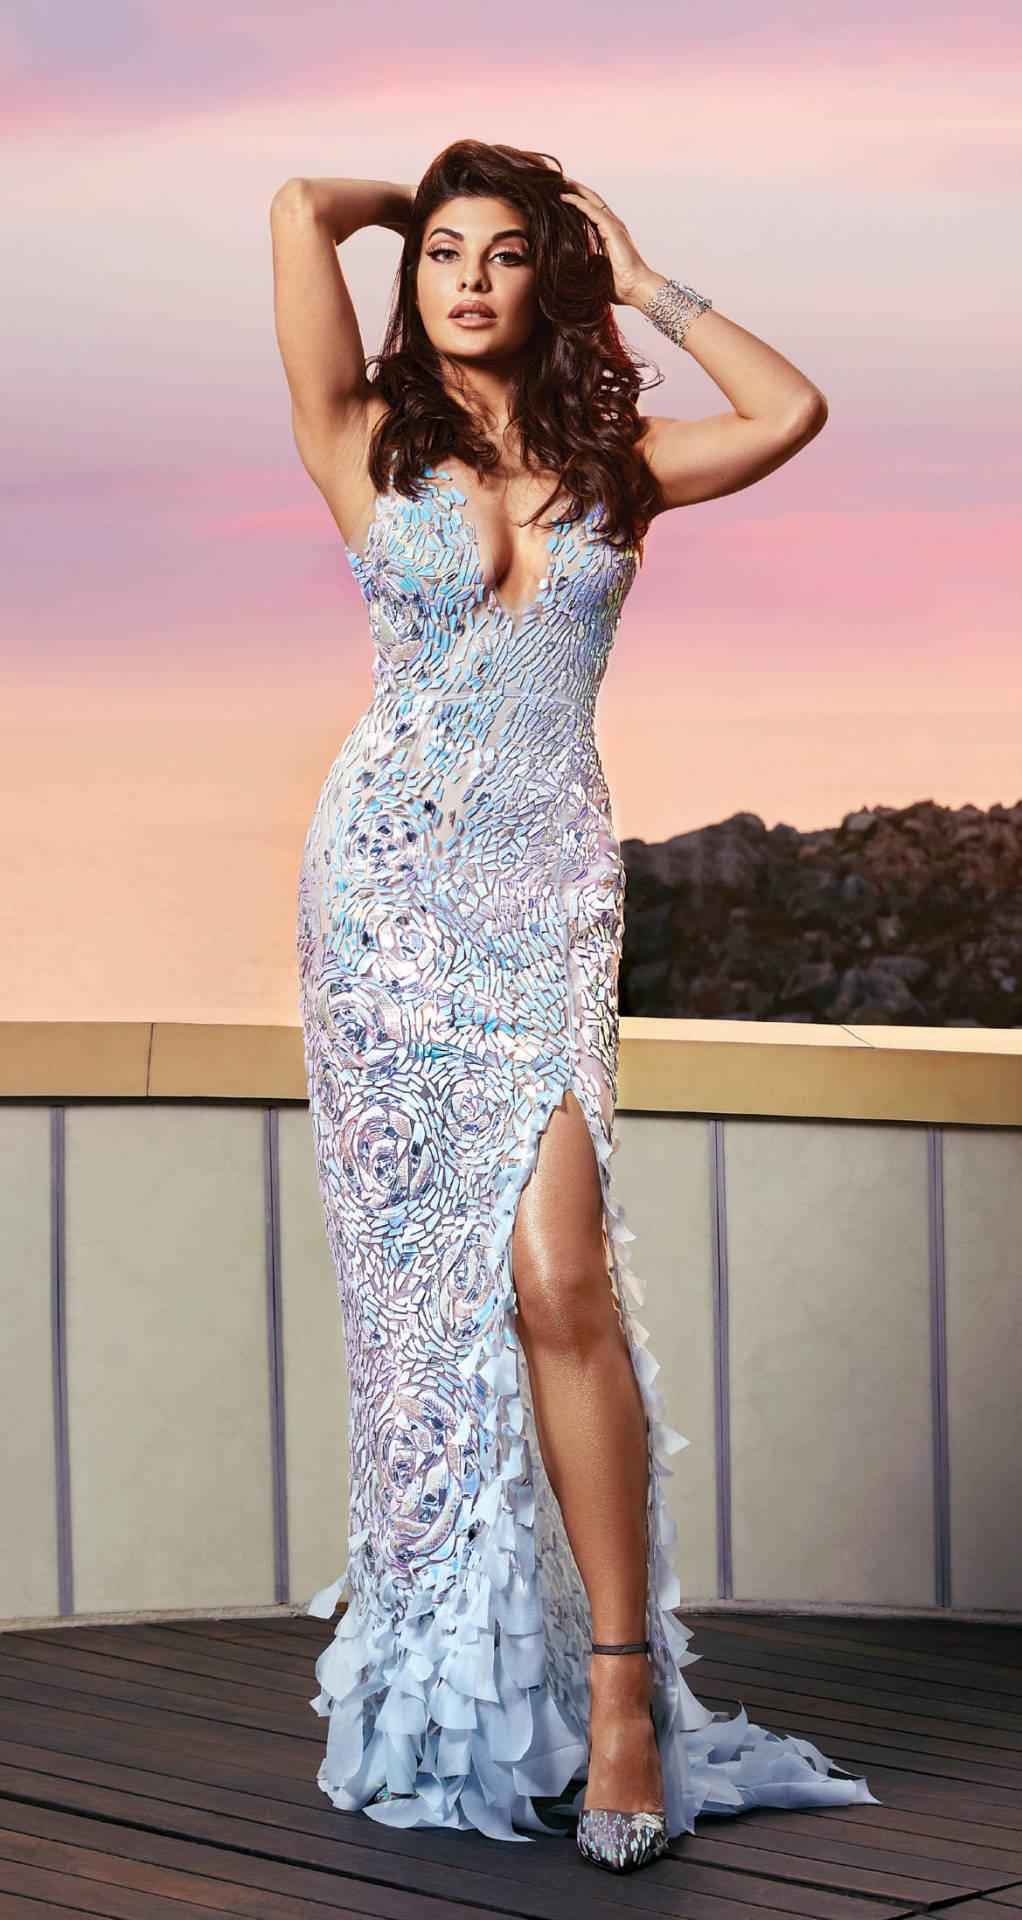 Jacqueline Fernandez For Hello India 2020 Photoshoot | Picture 1714746